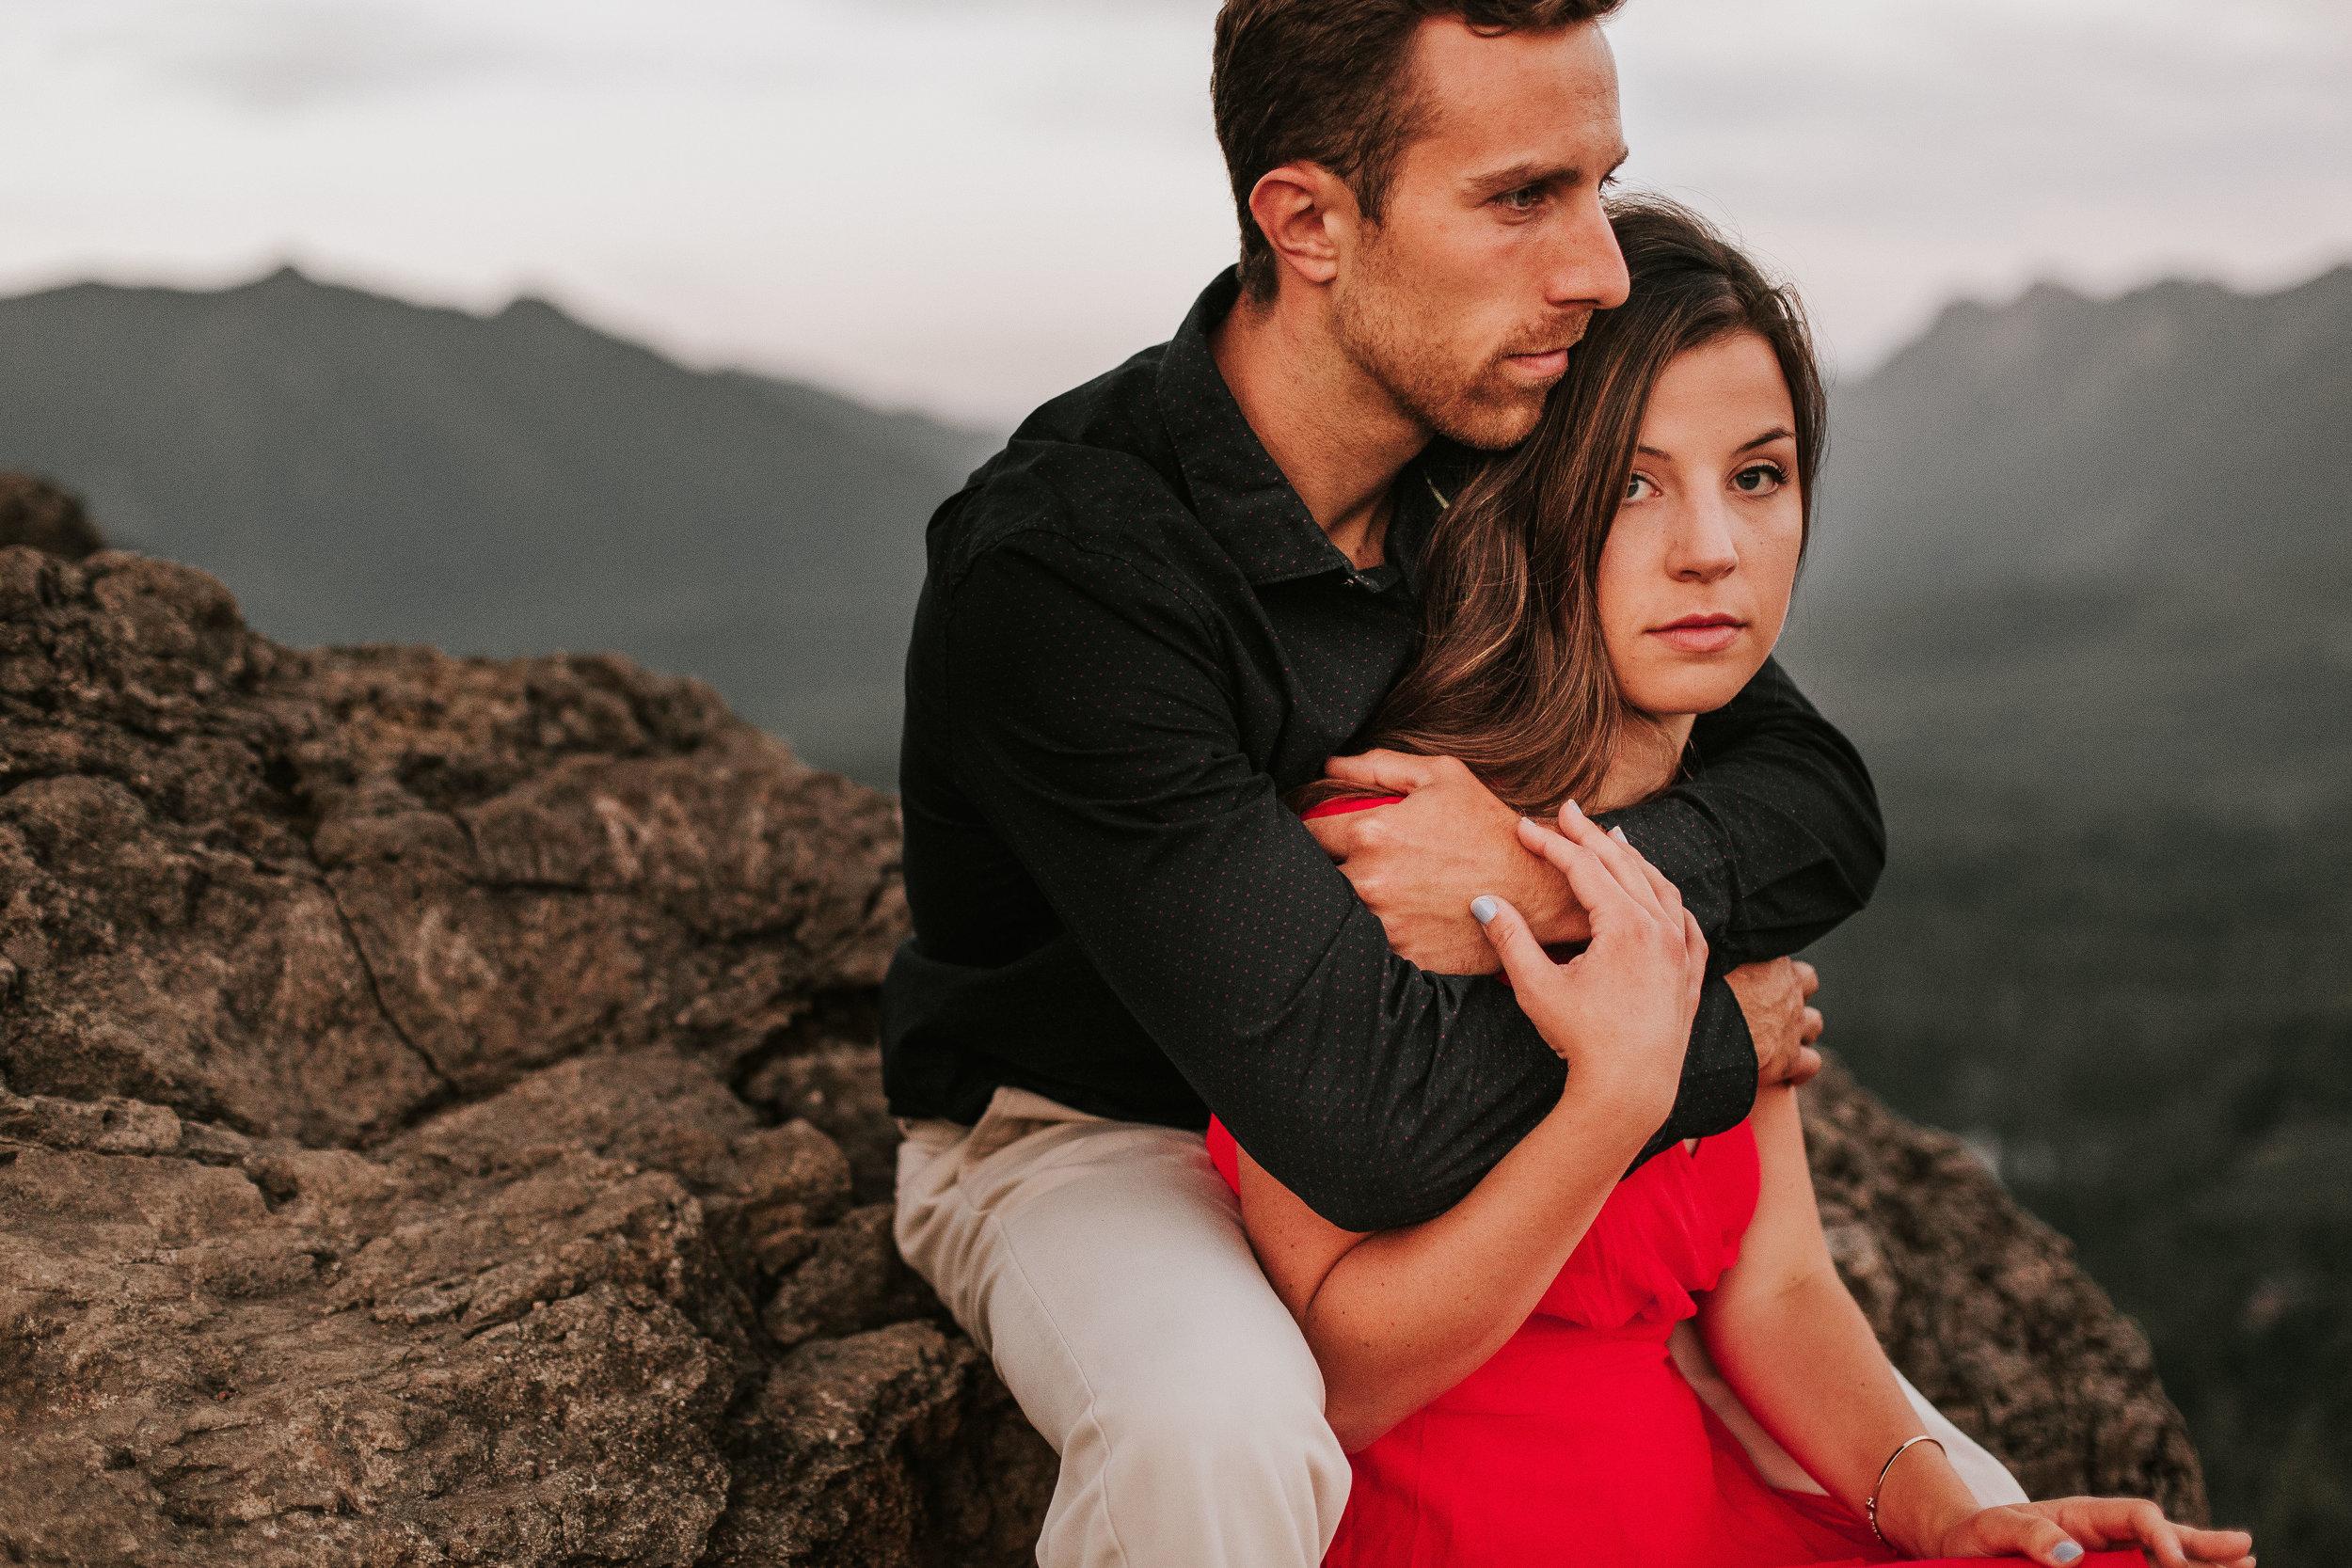 nicole-daacke-photography-rattlesnake-ridge-adventurous-engagement-session-hiking-seattle-washington-destinatino-elopement-intimate-wedding-photographer-33.jpg